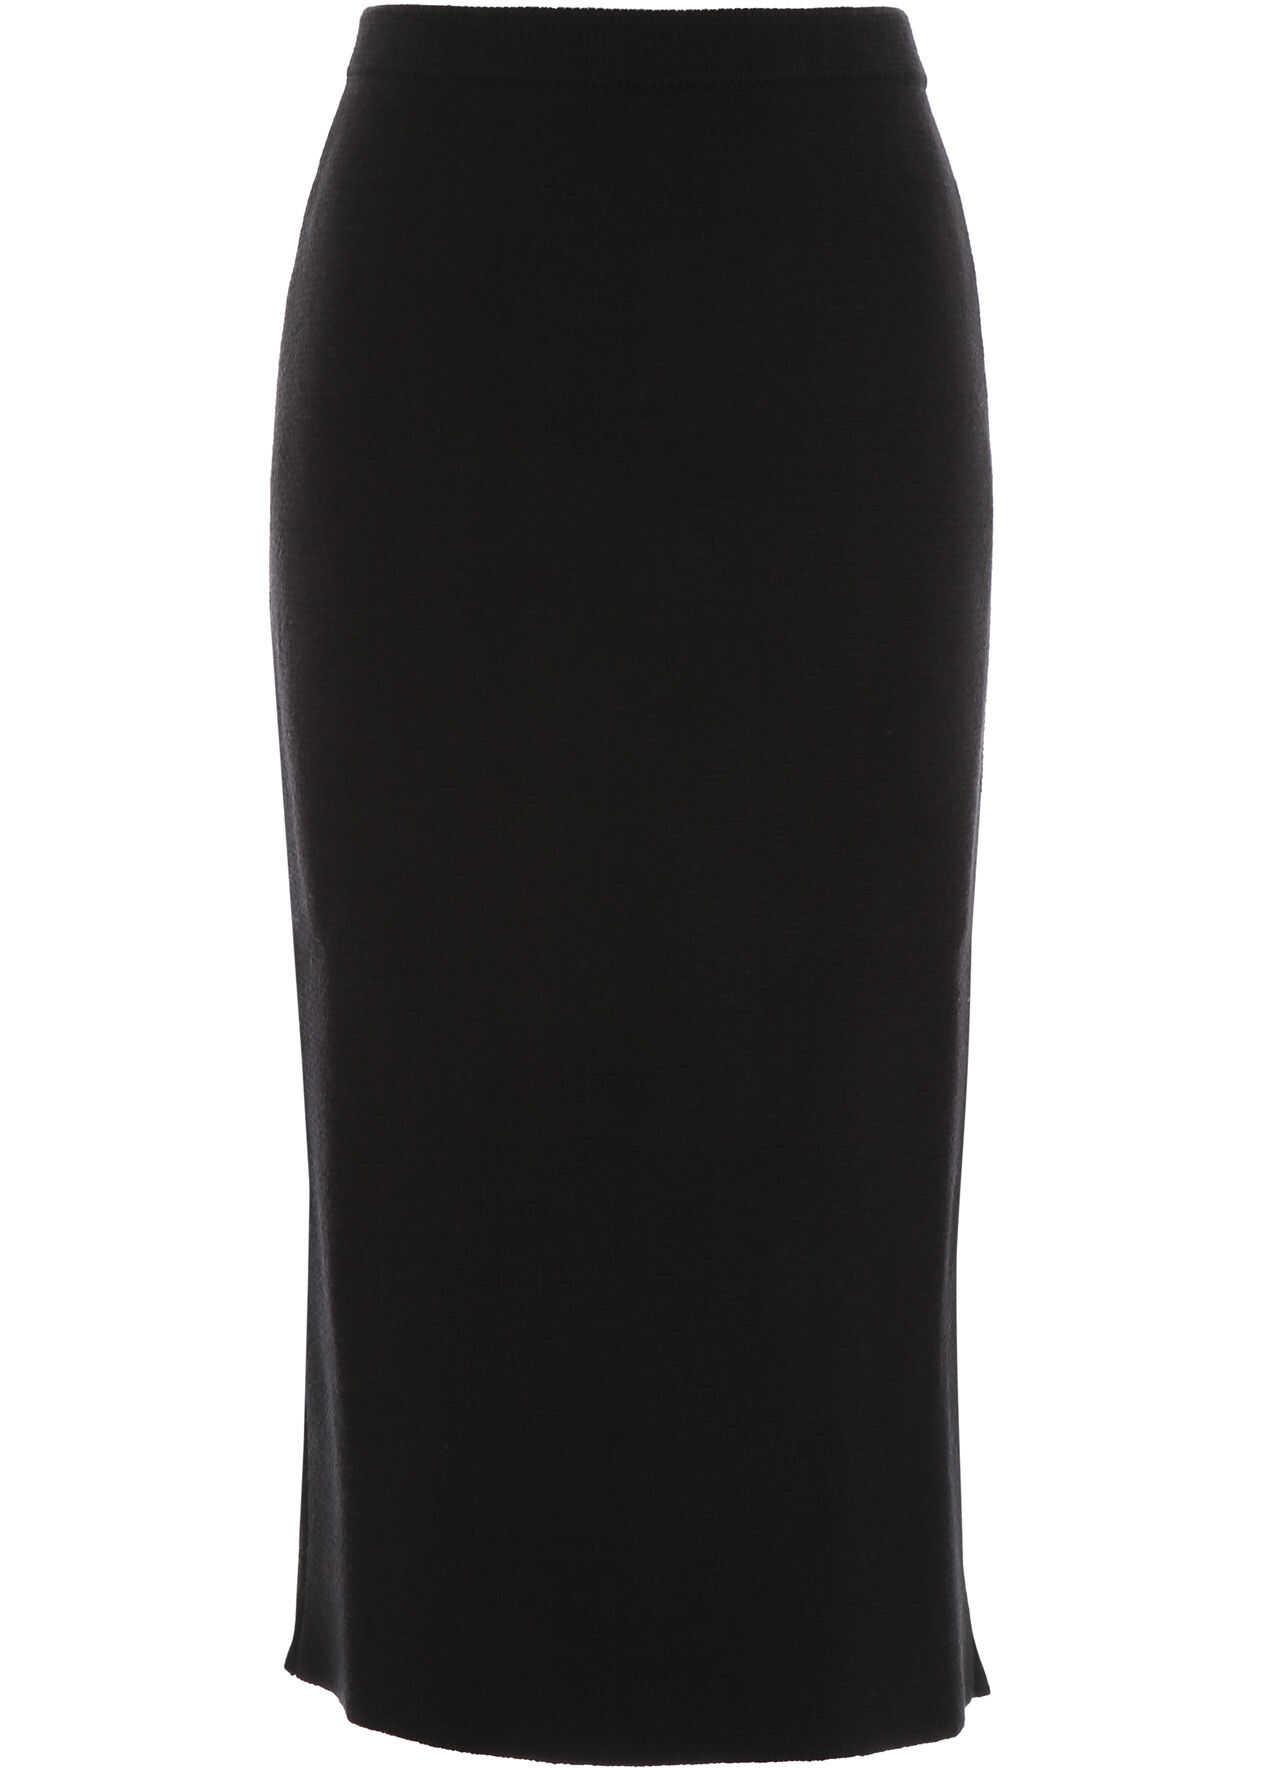 Alessandra Rich Wool Skirt BLACK